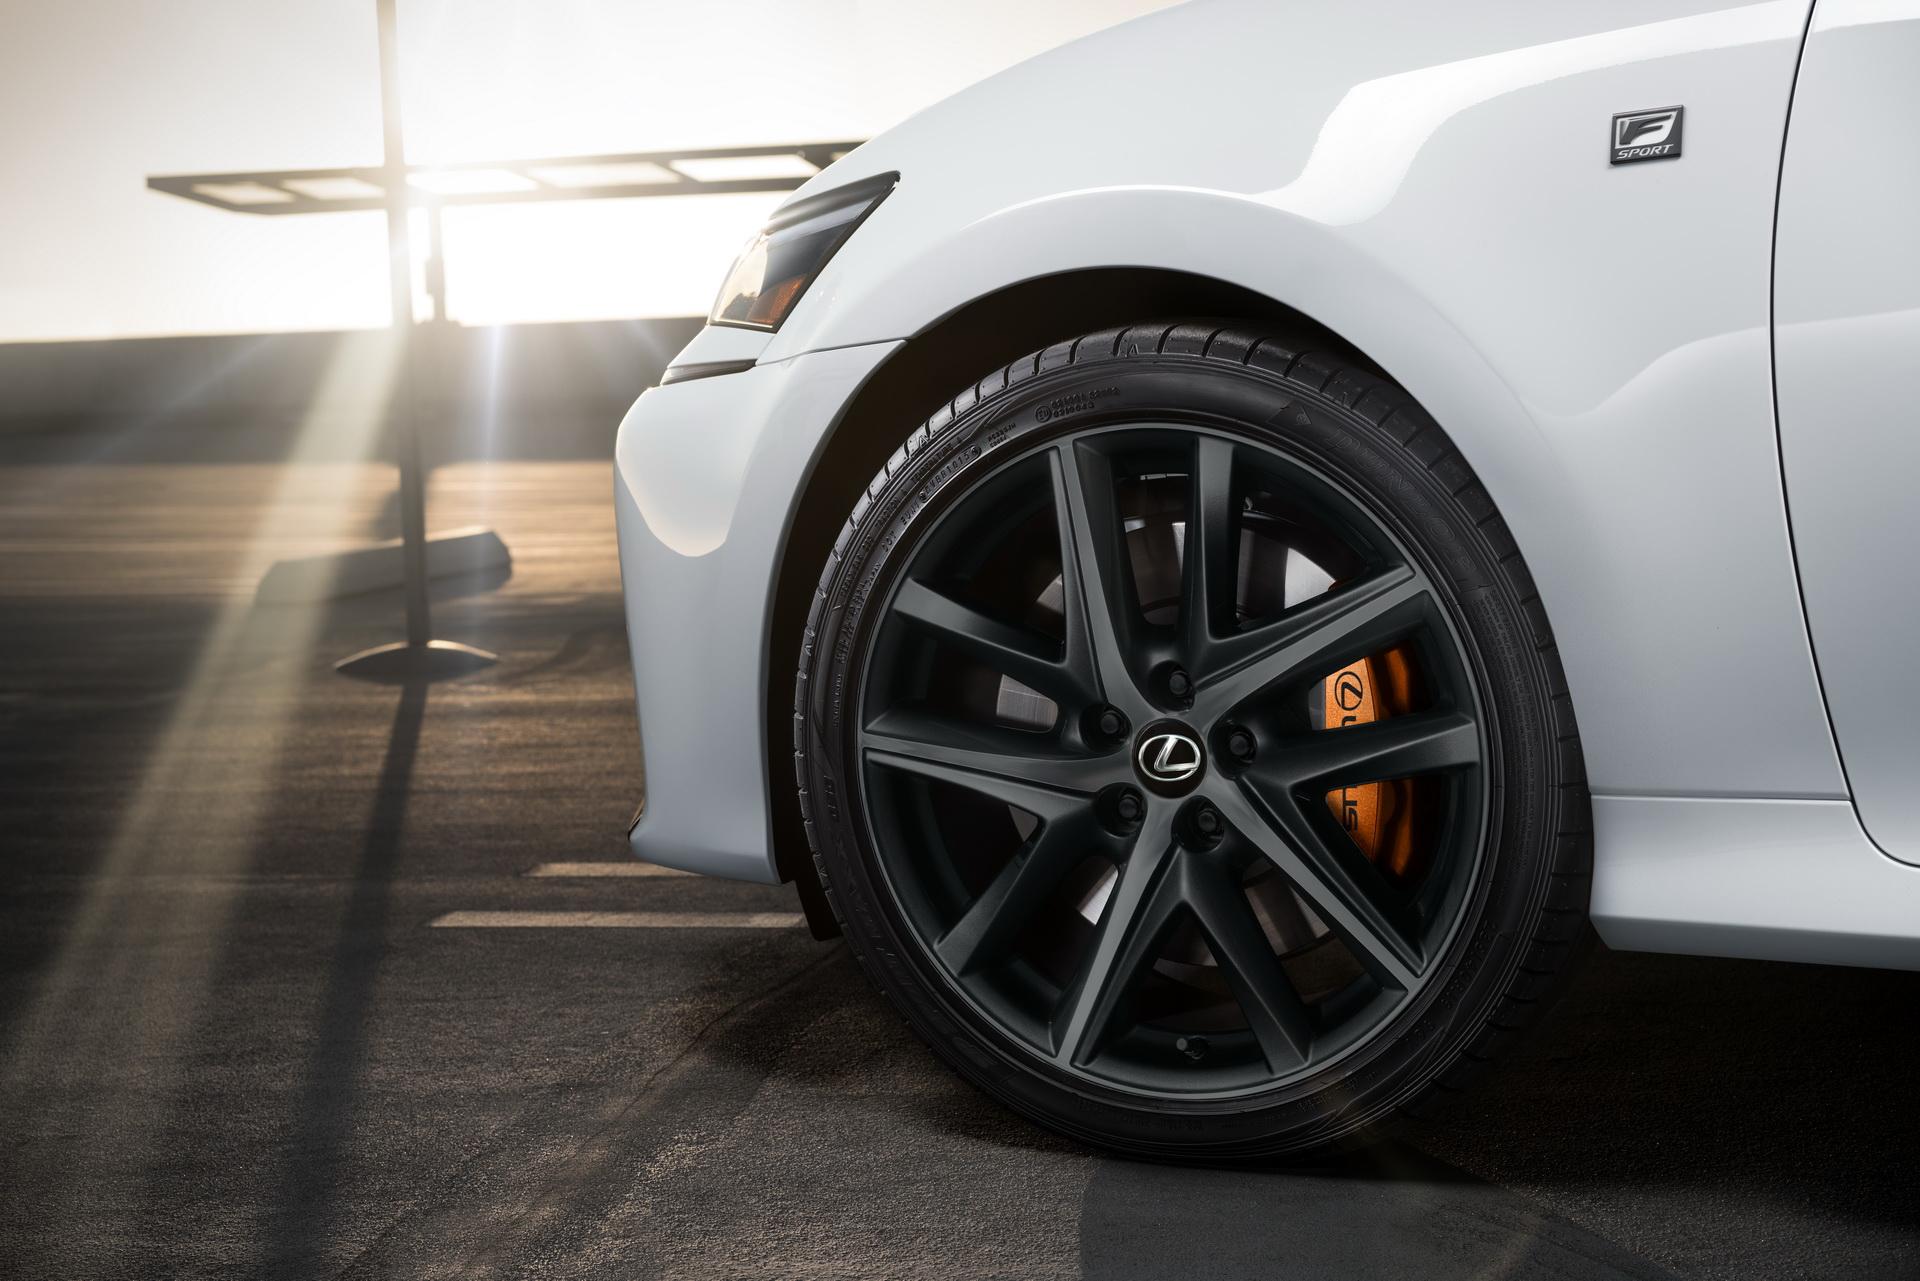 2020-lexus-gs-350-f-sport-black-line-edition-3.jpg